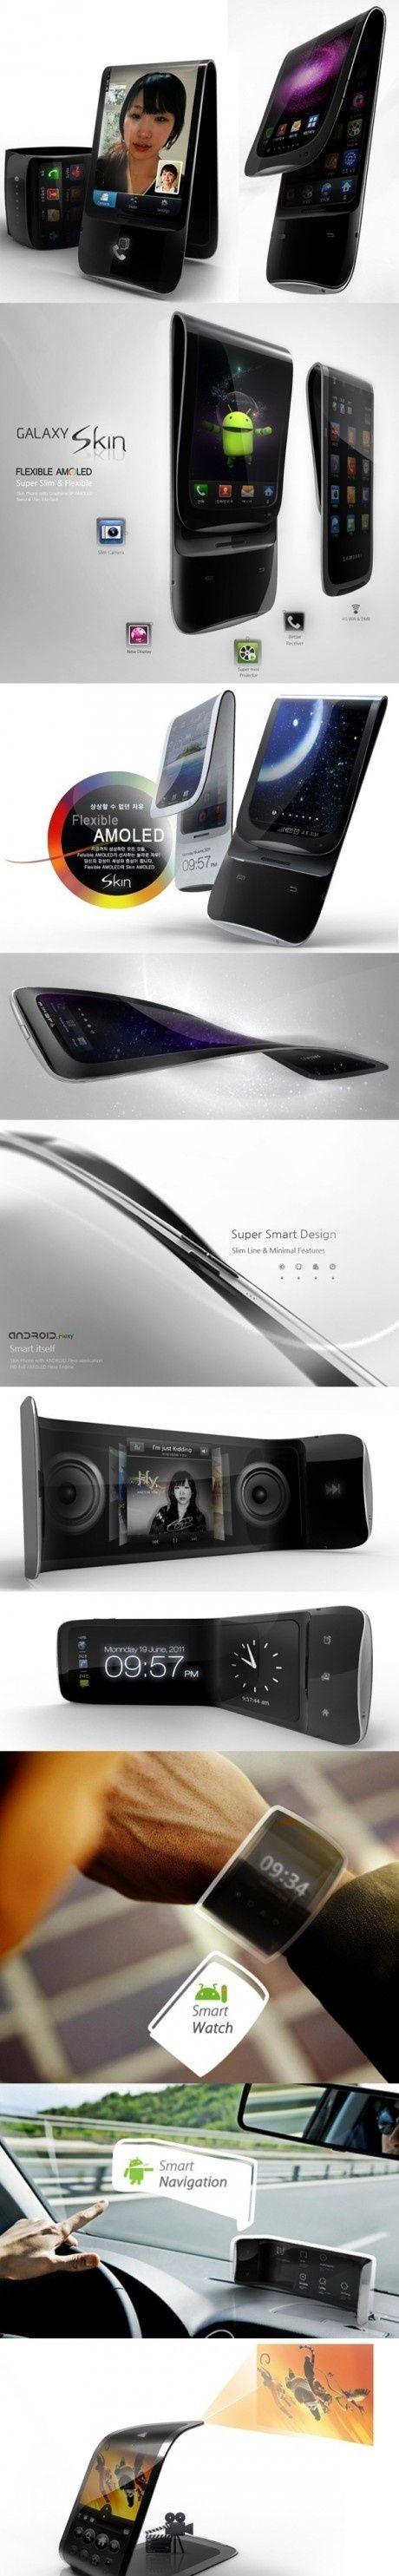 Samsung Galaxy Skin - �NSKER!